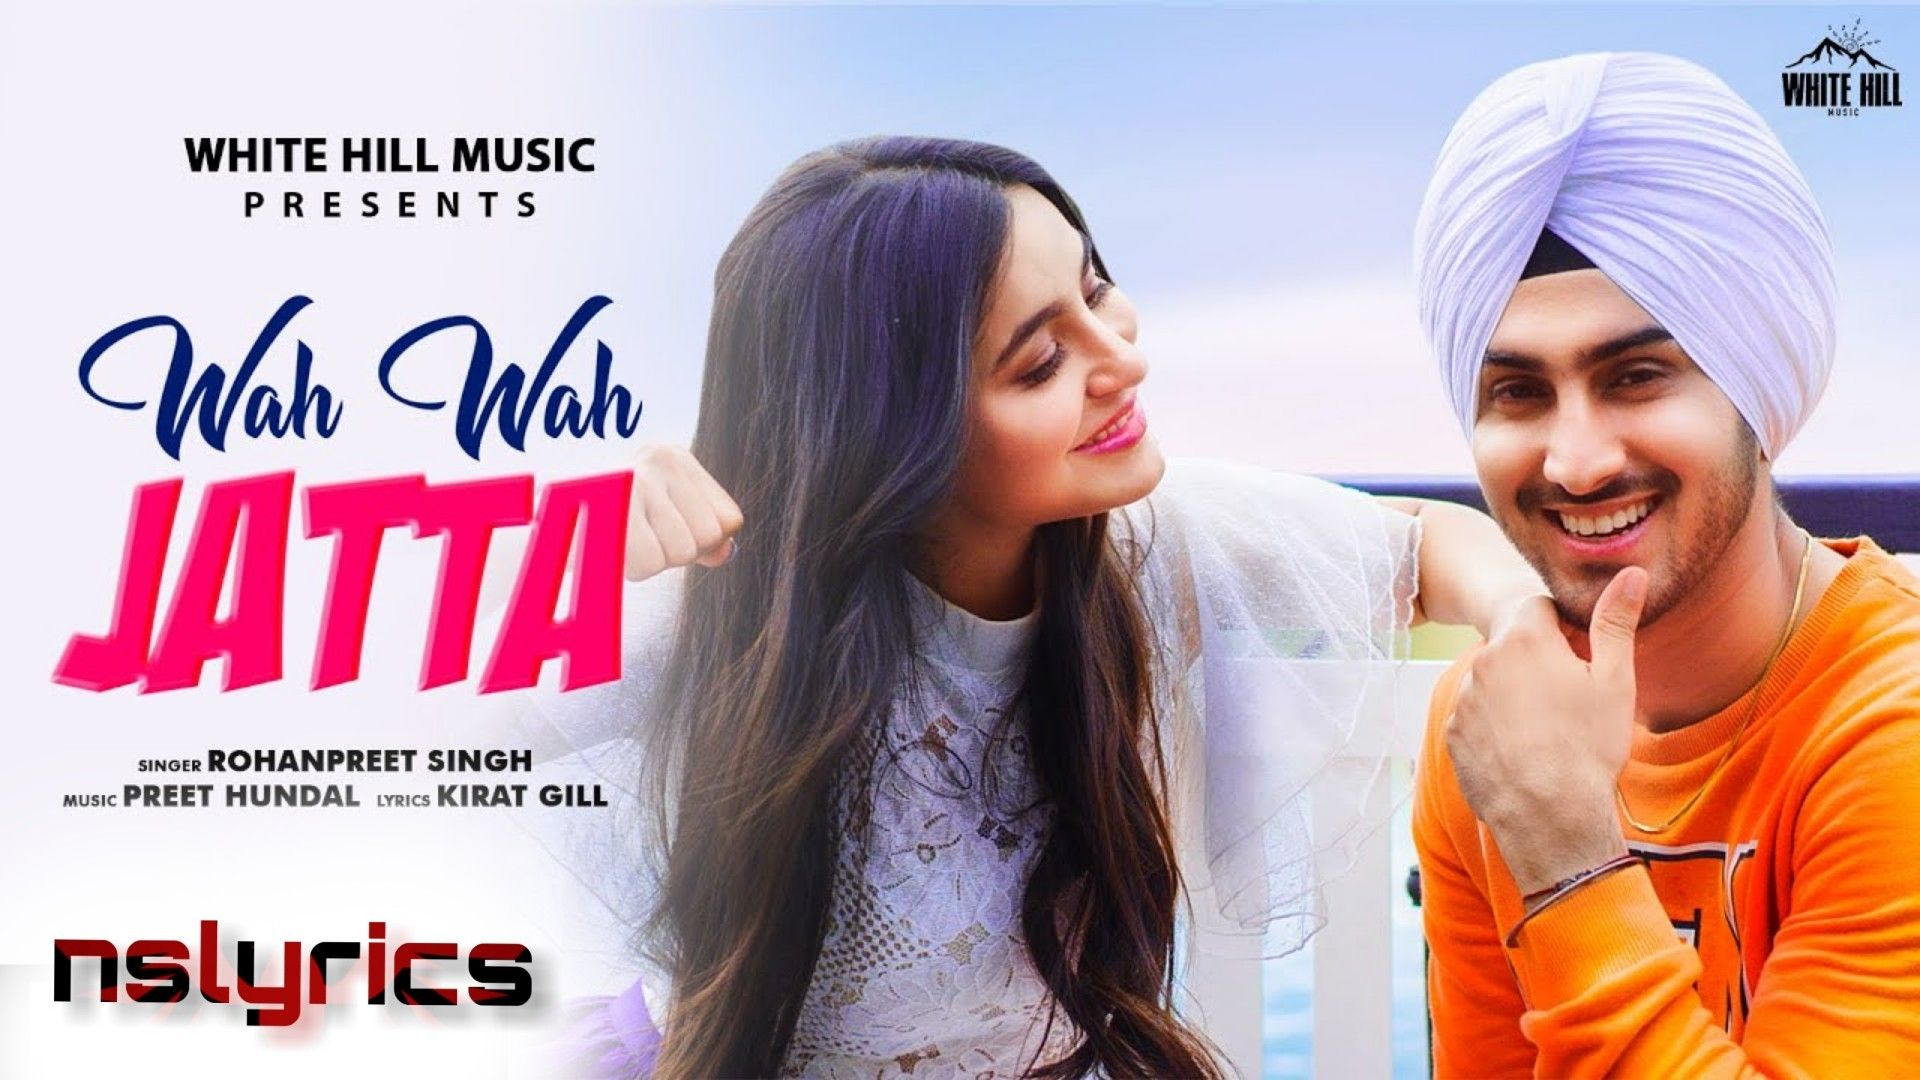 Wah Wah Jatta Song Lyrics Singer Rohanpreet Singh Music Preet Hundal In 2020 Mp3 Song Download Mp3 Song New Song Download